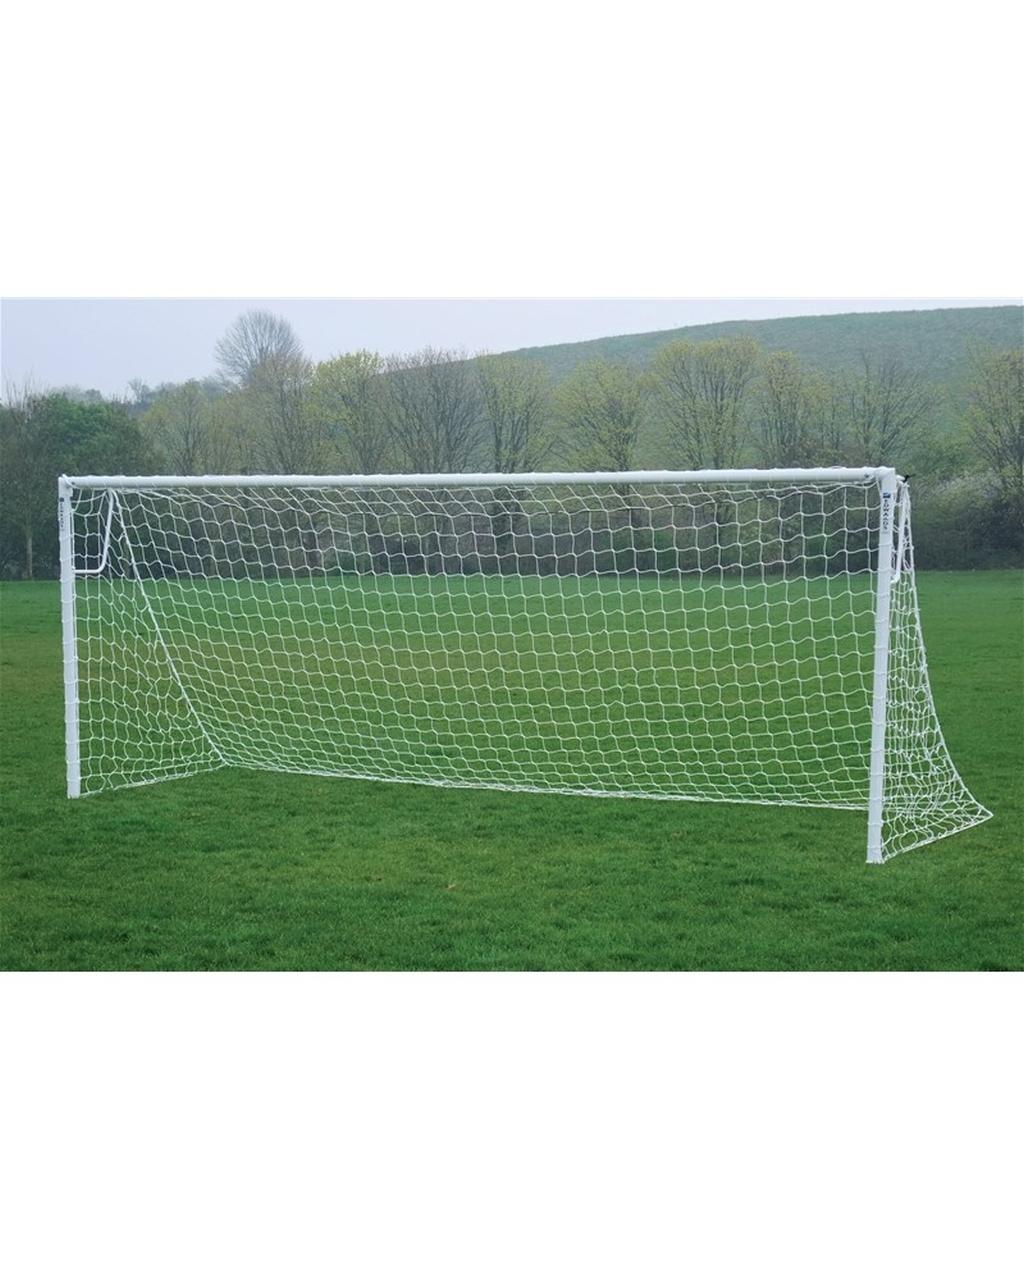 Mini Football Goals - Socketed